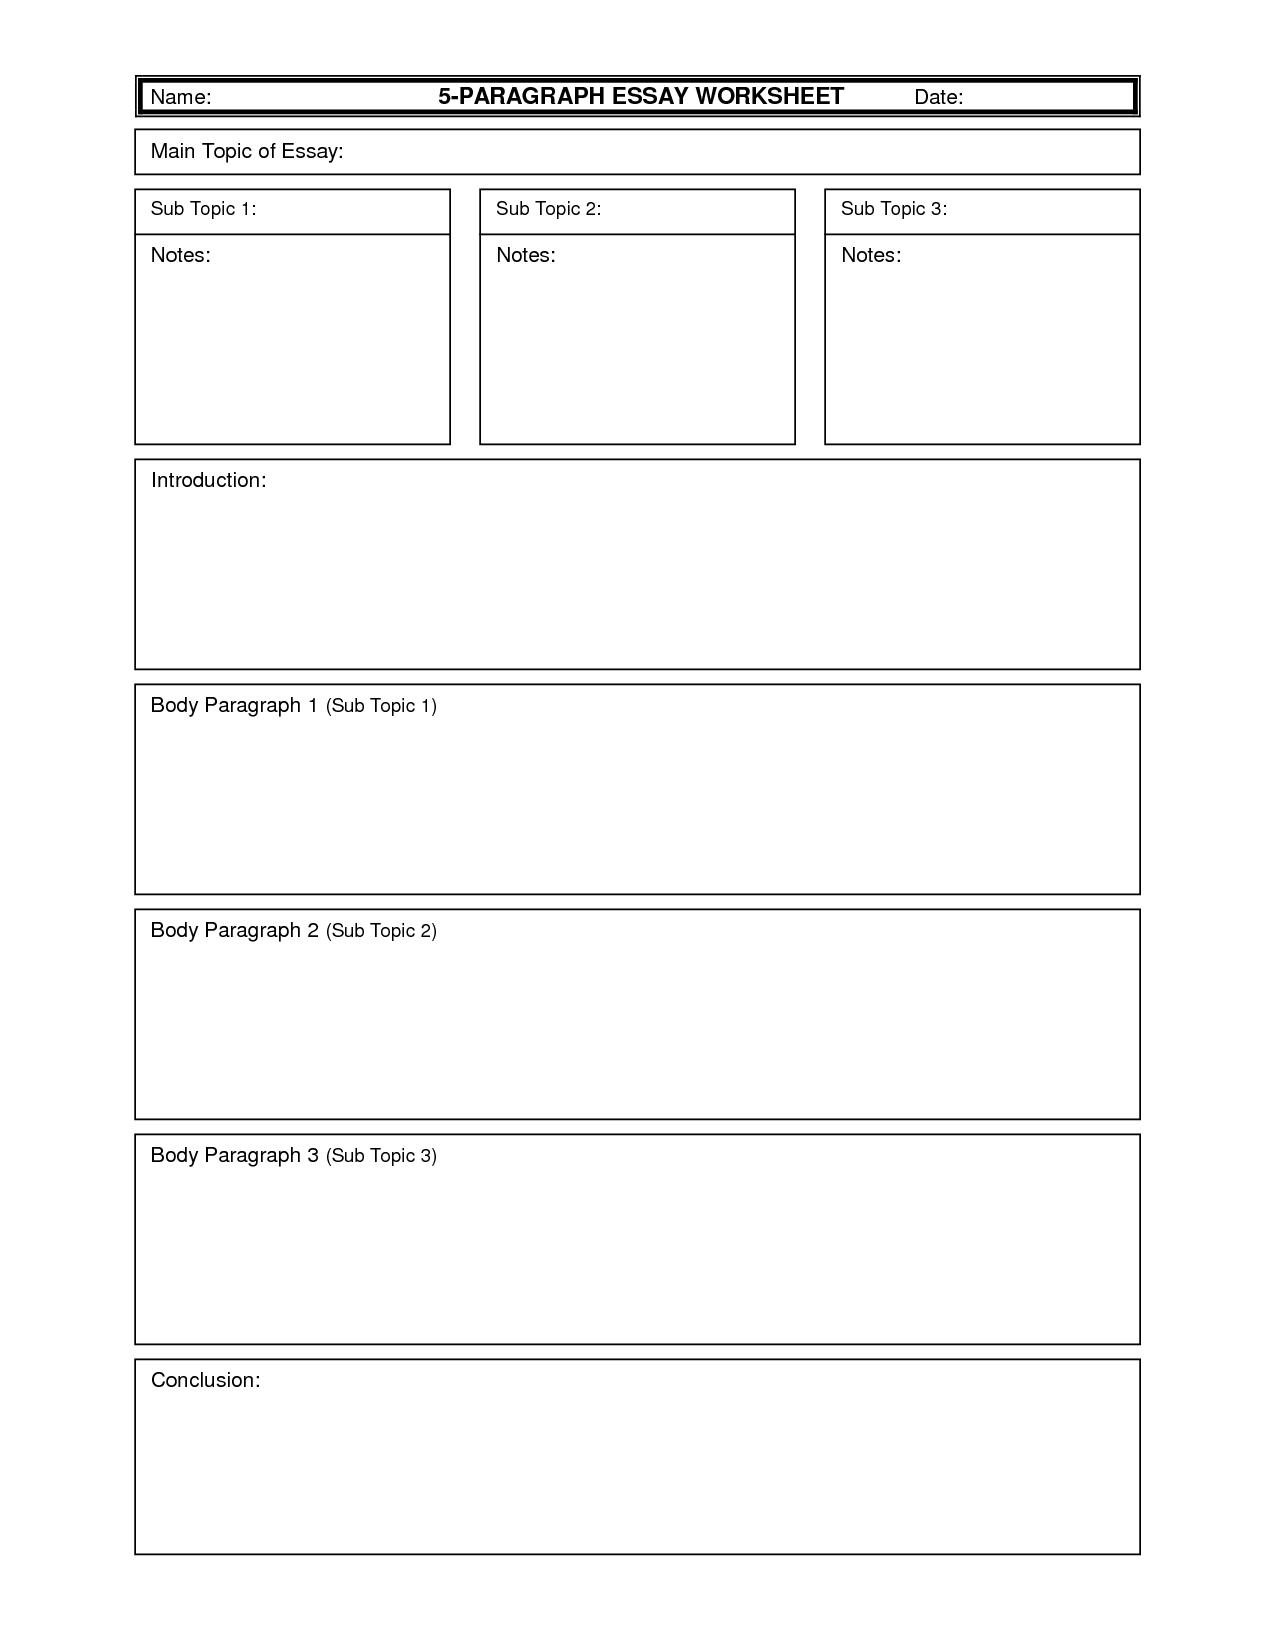 020 Essay Example Writing Worksheets Thatsnotus